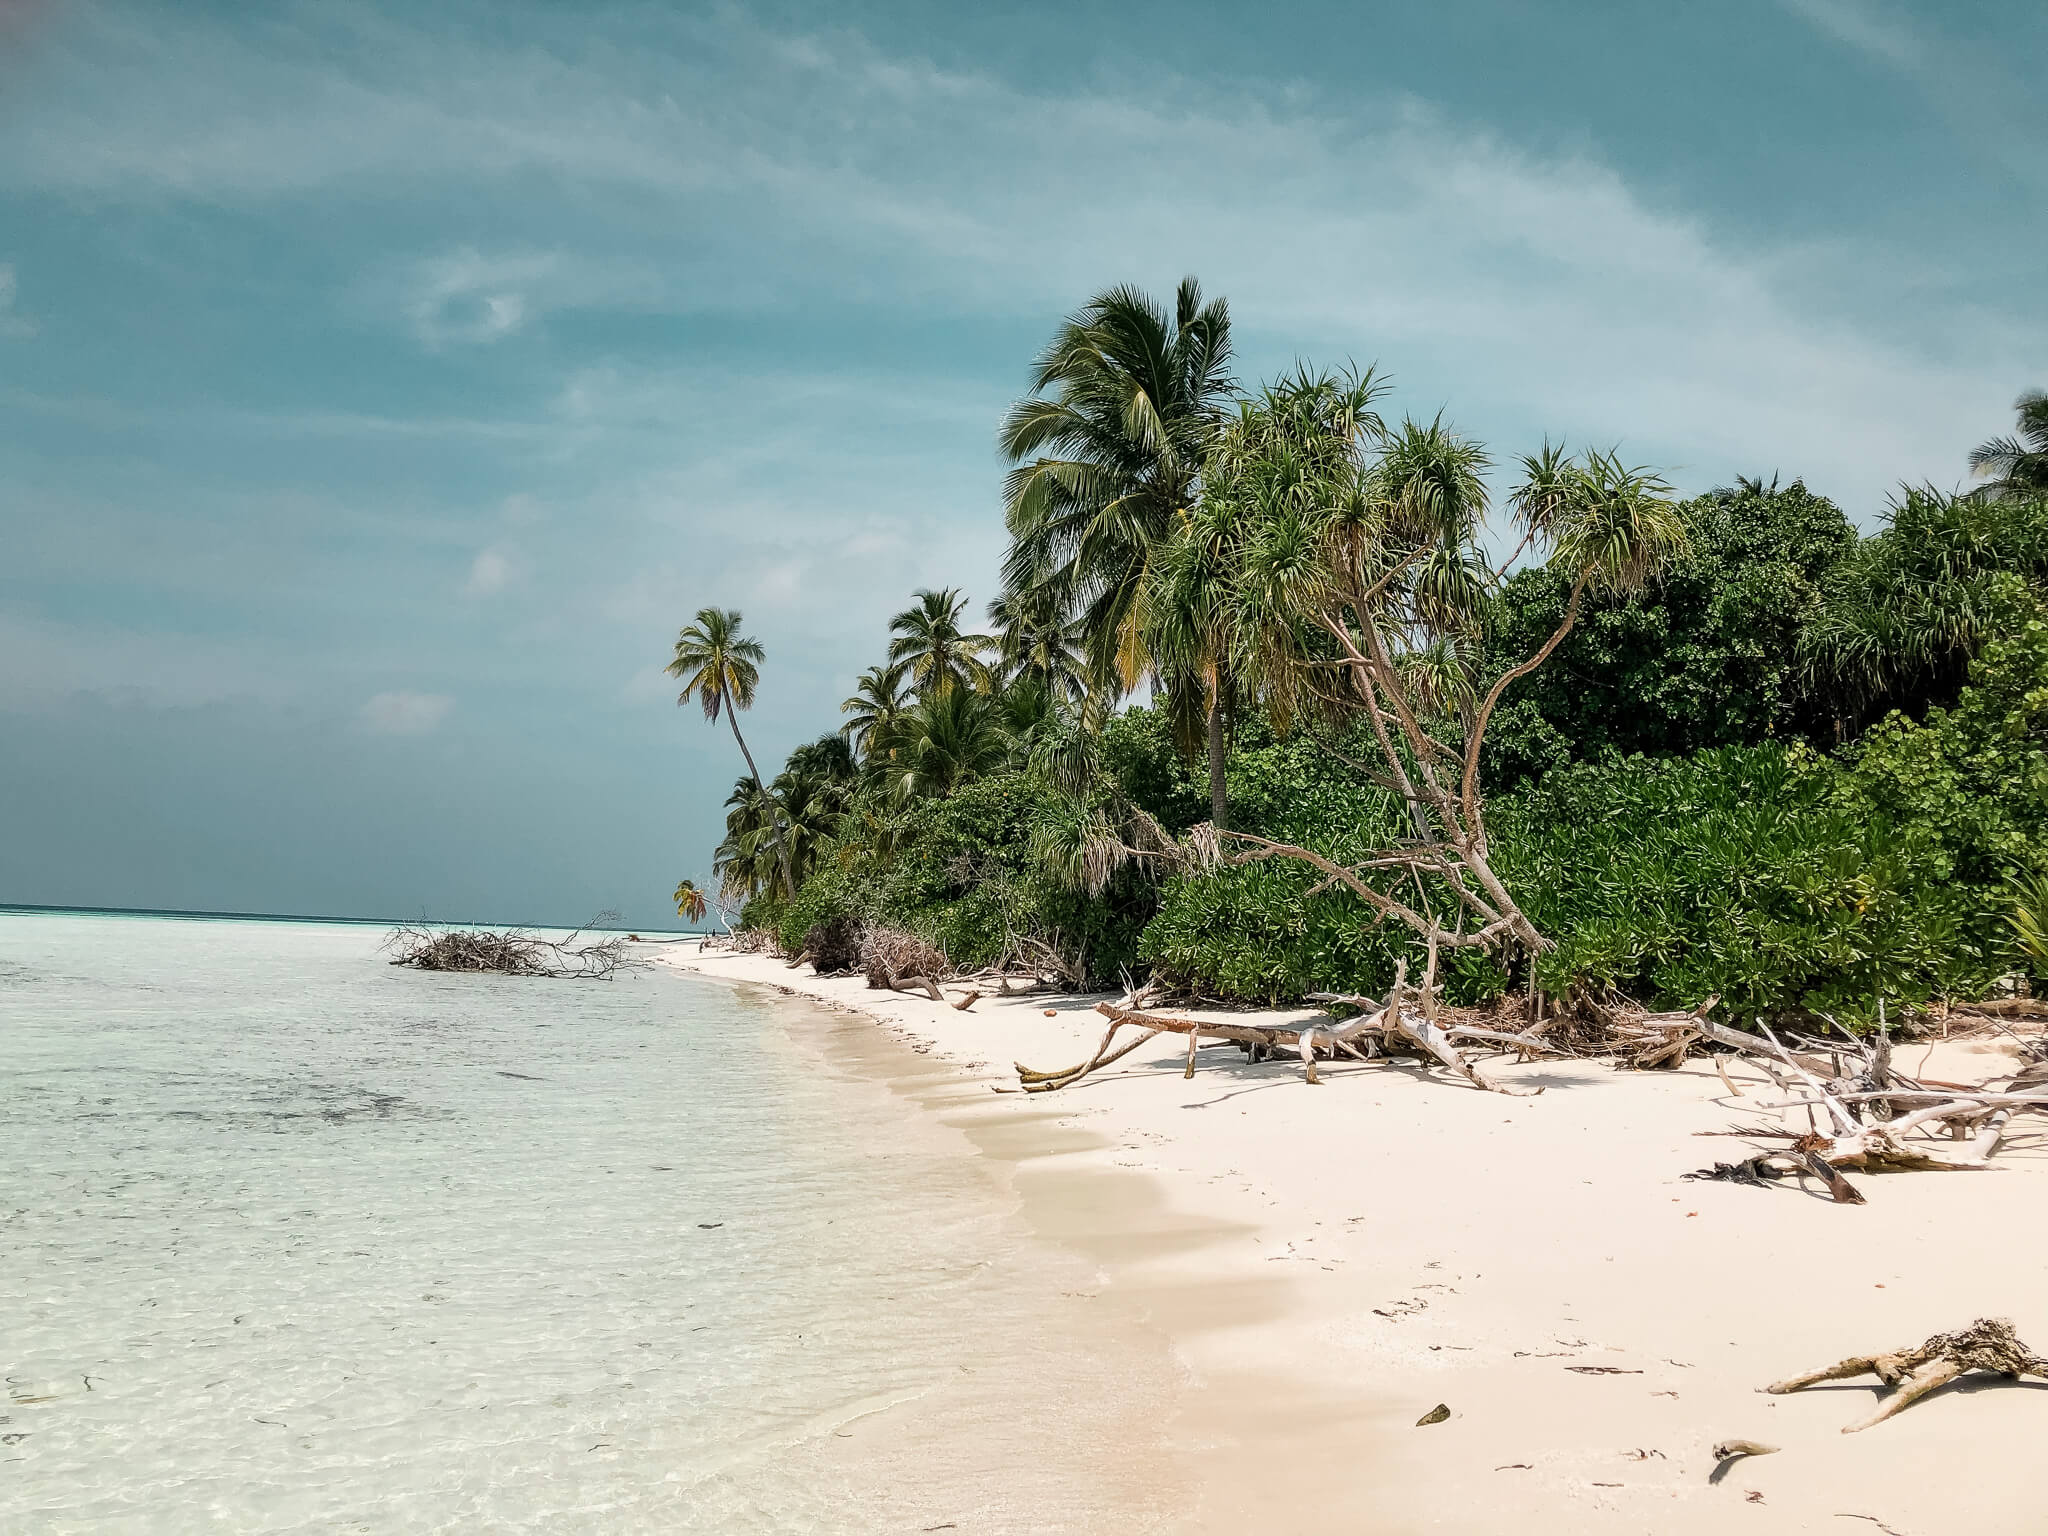 cudowna plaża, Malediwy